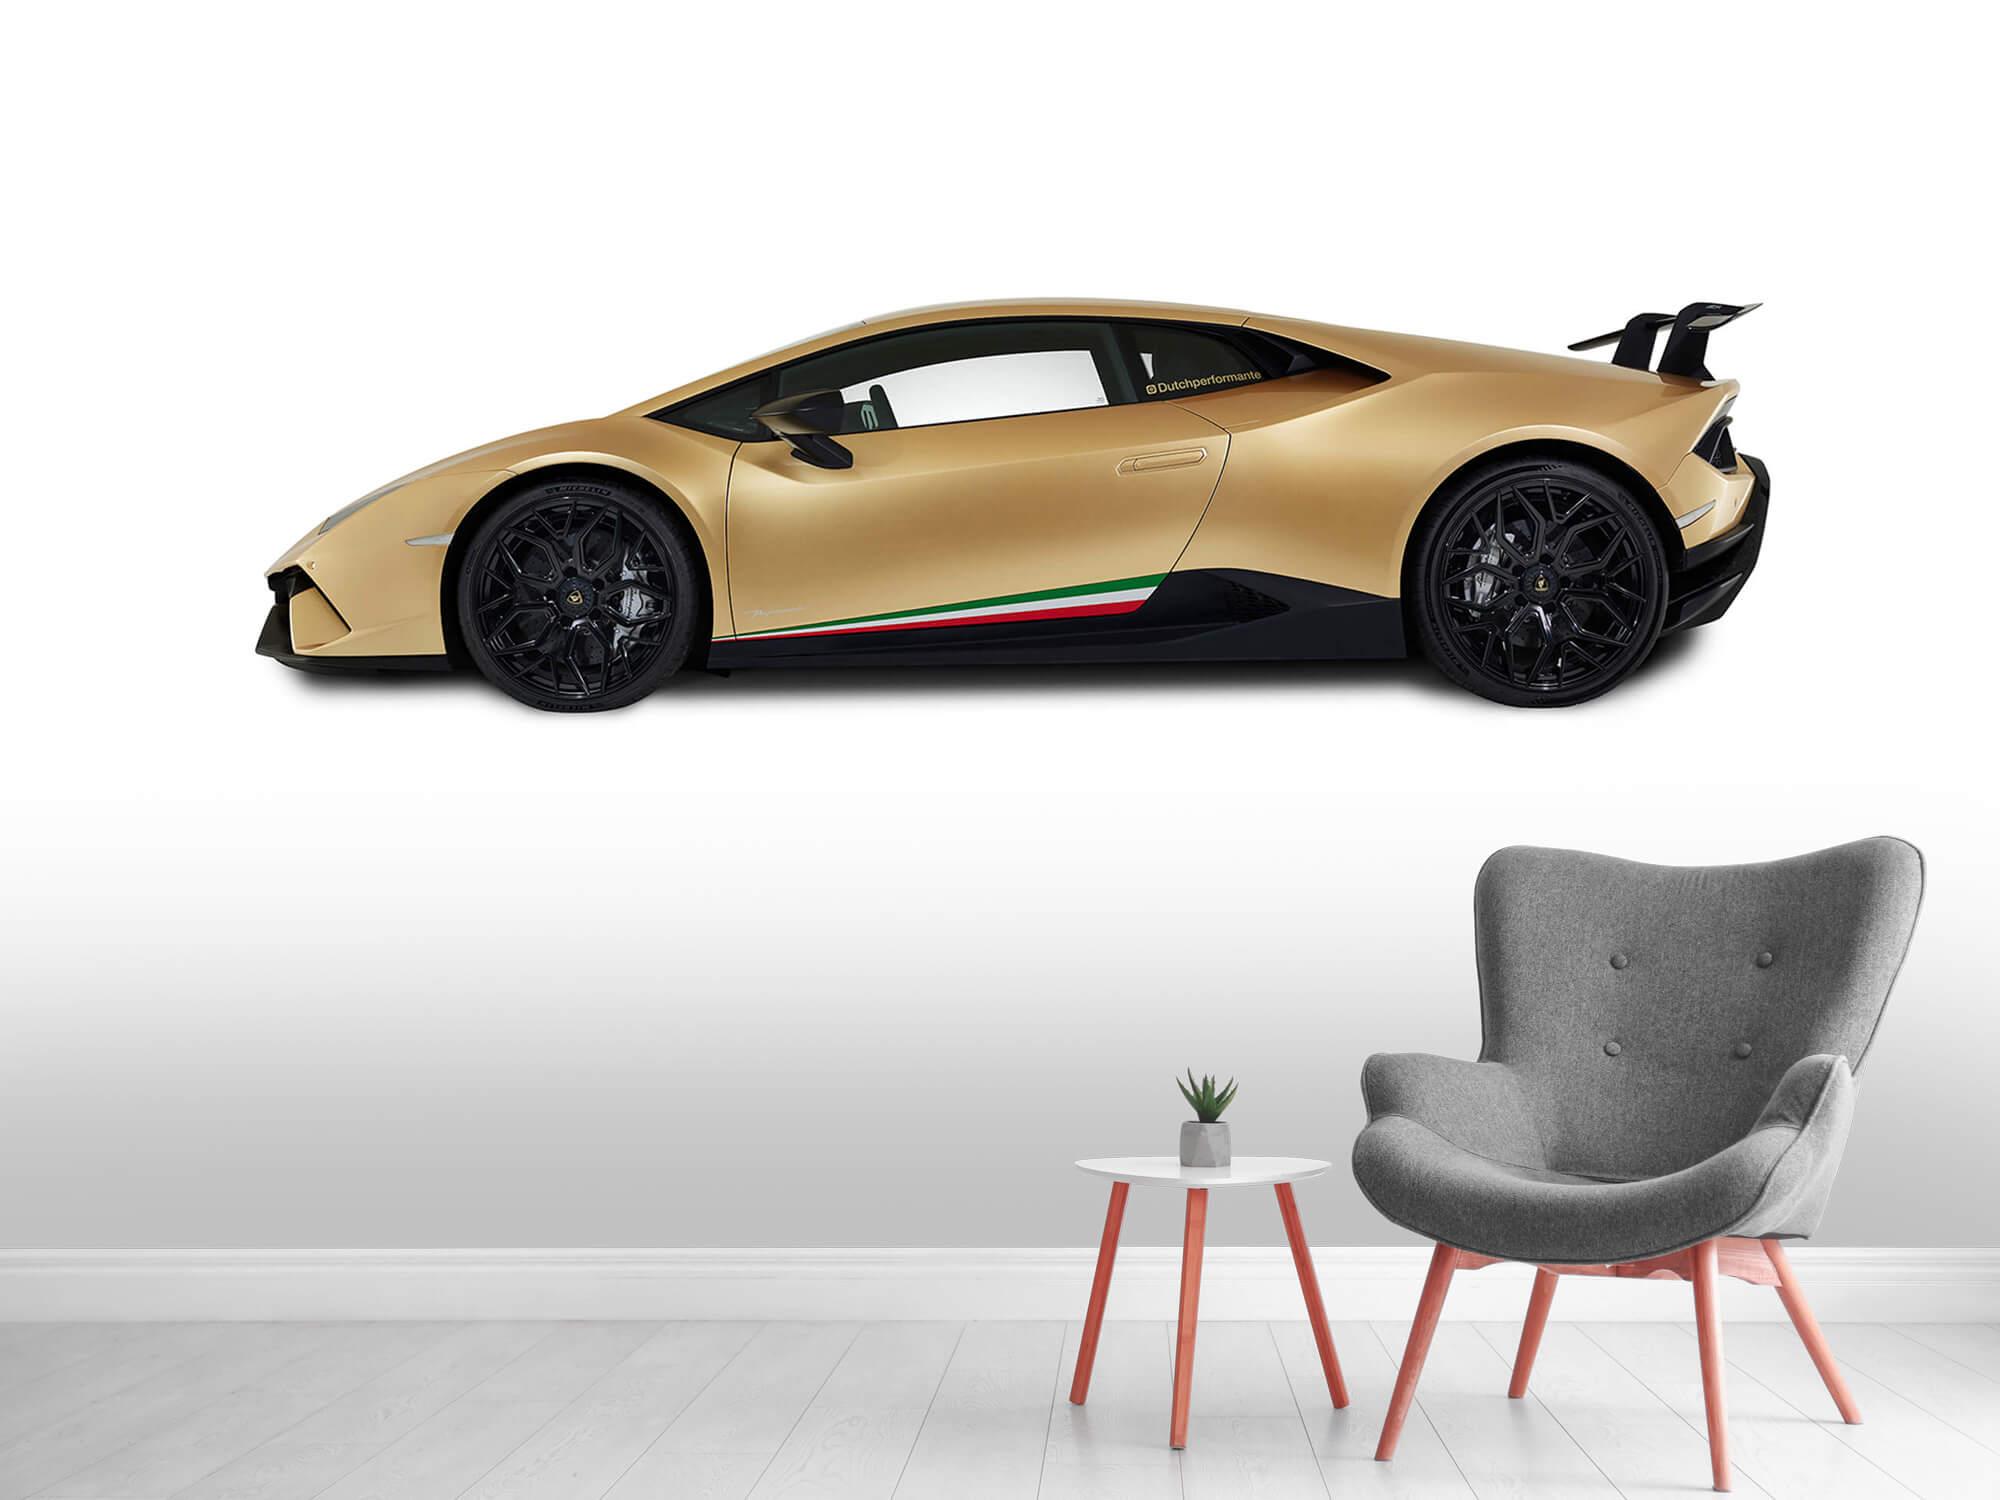 Wallpaper Lamborghini Huracán - Zijkant, wit 5